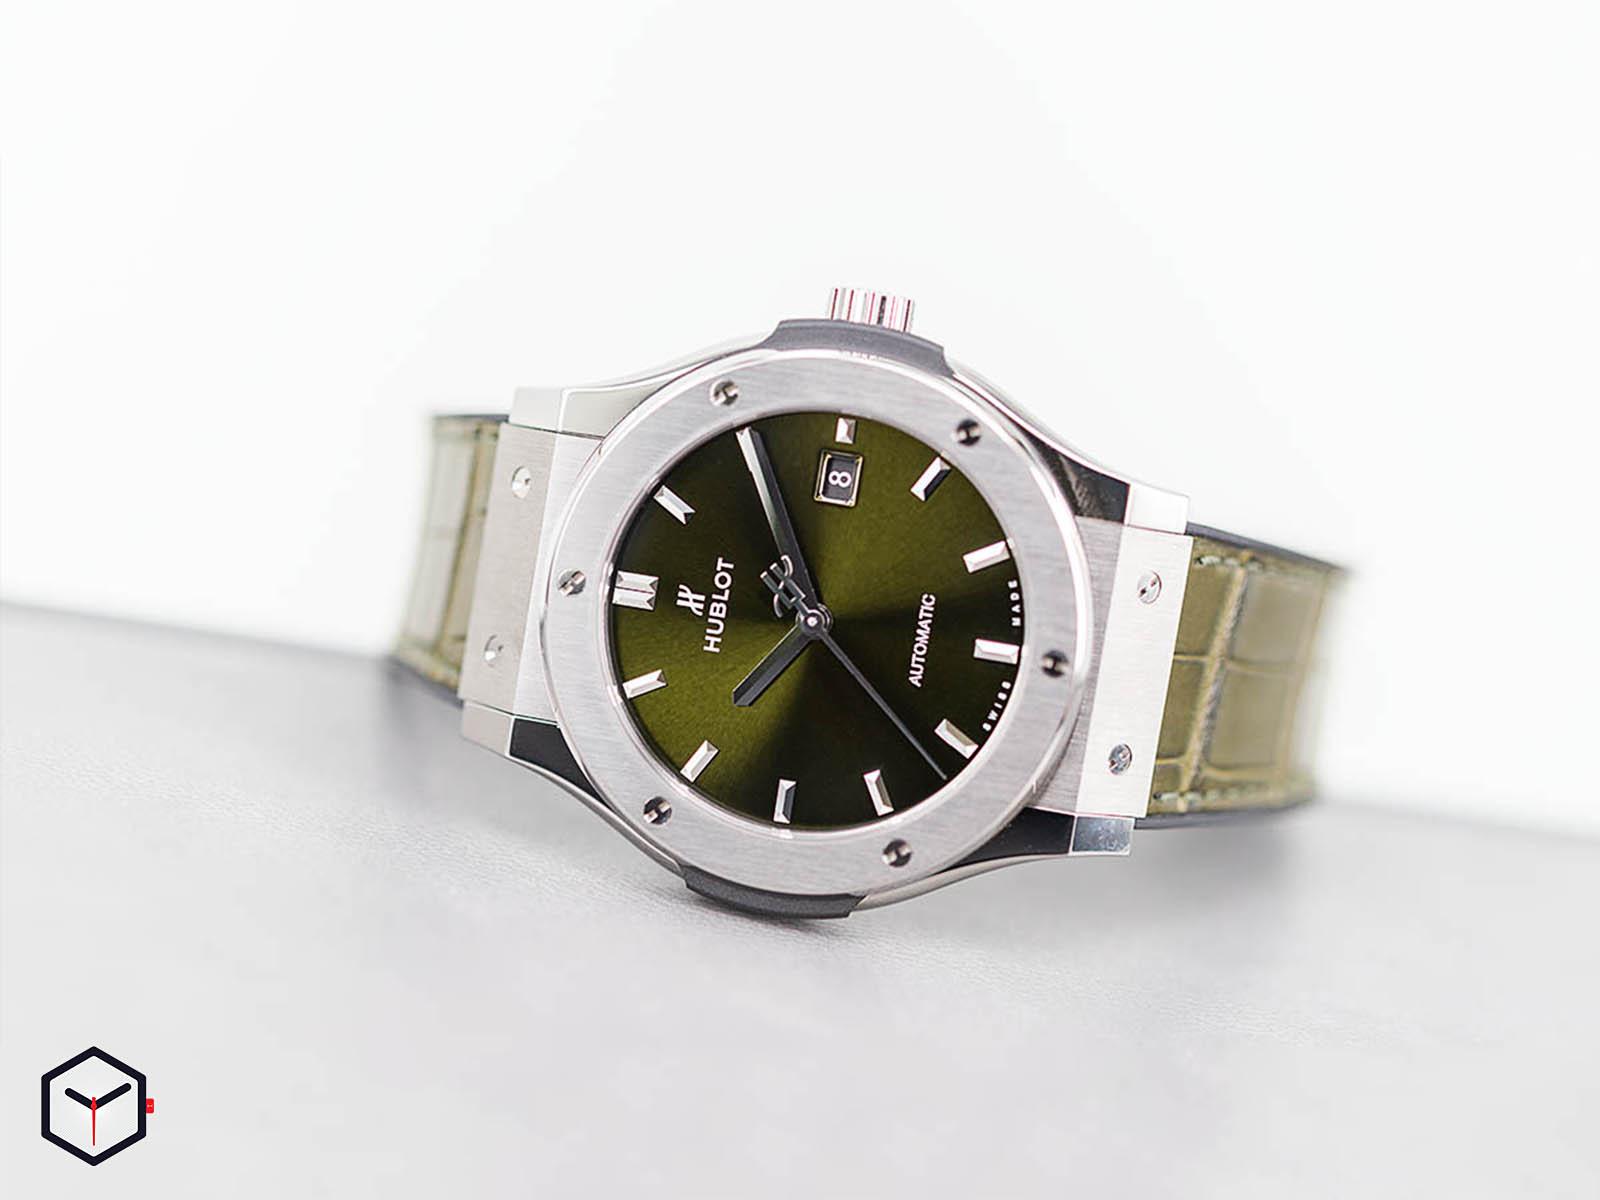 565-nx-8970-lr-hublot-classic-fusion-green-titanium-38mm-9.jpg